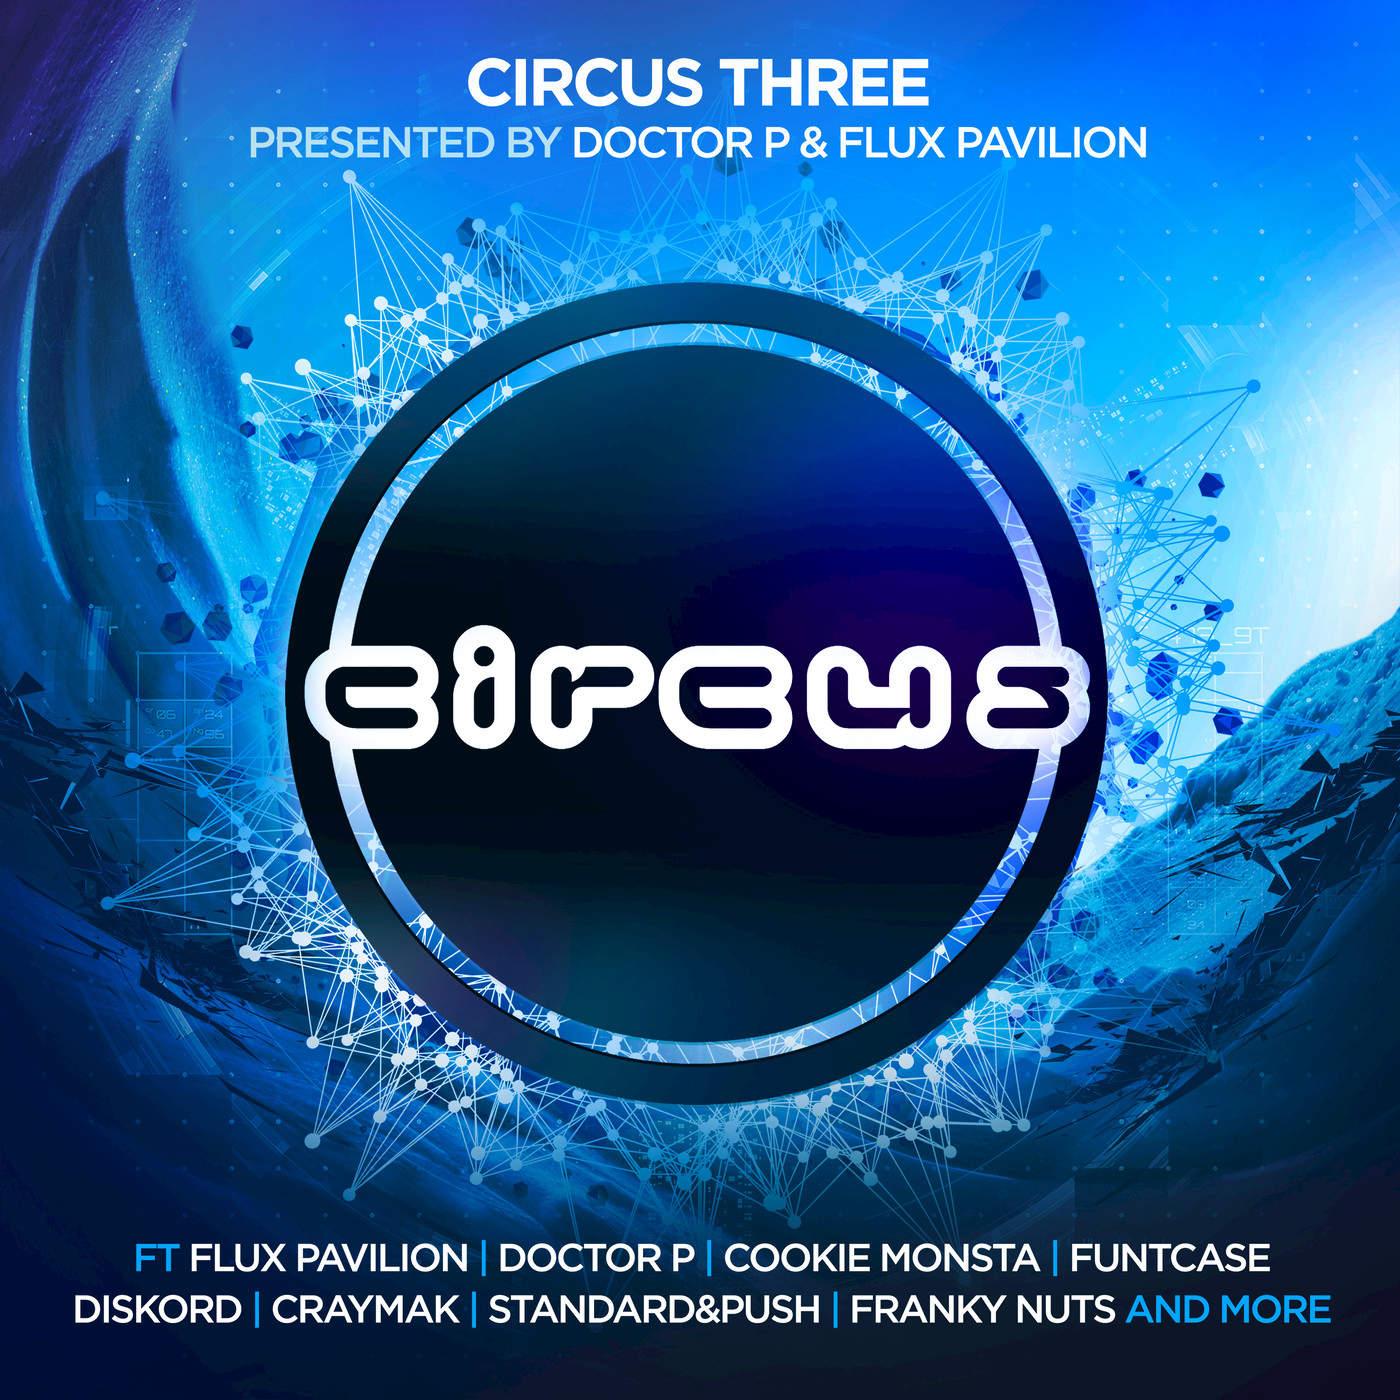 Doctor P & Flux Pavilion - Circus Three Cover